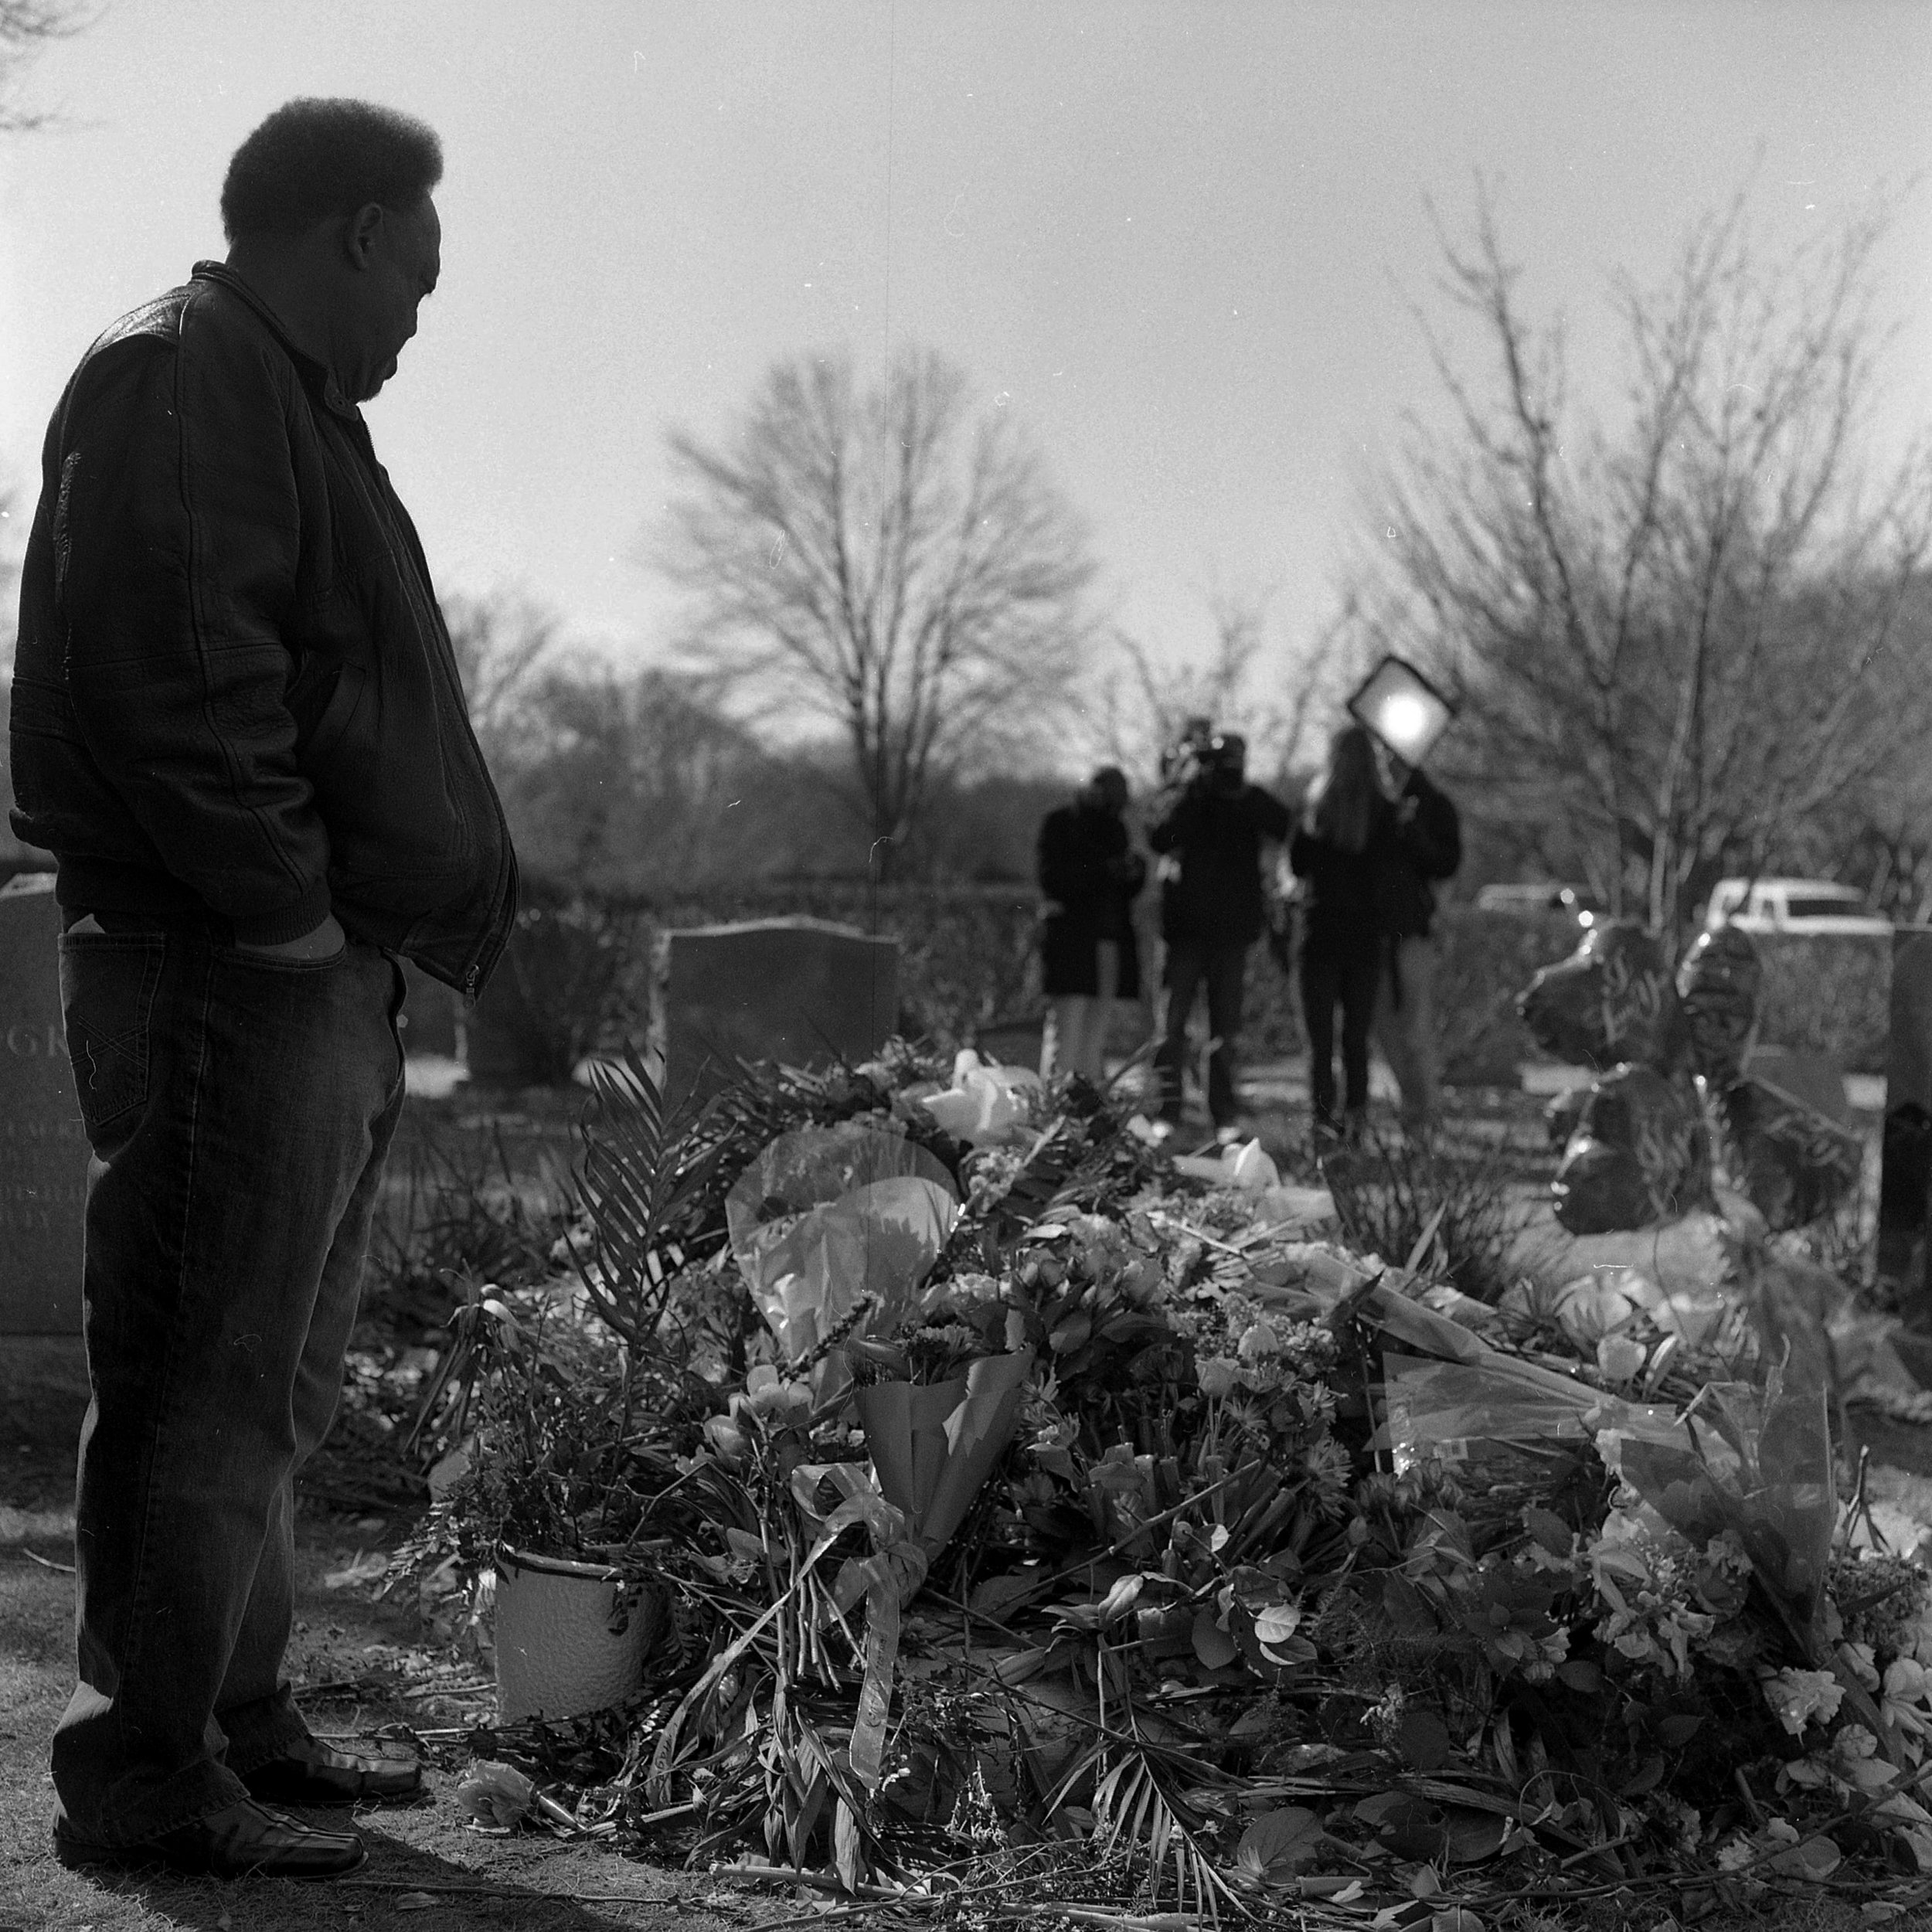 Whitney Houston's grave, Westfield, New Jersey, 2012